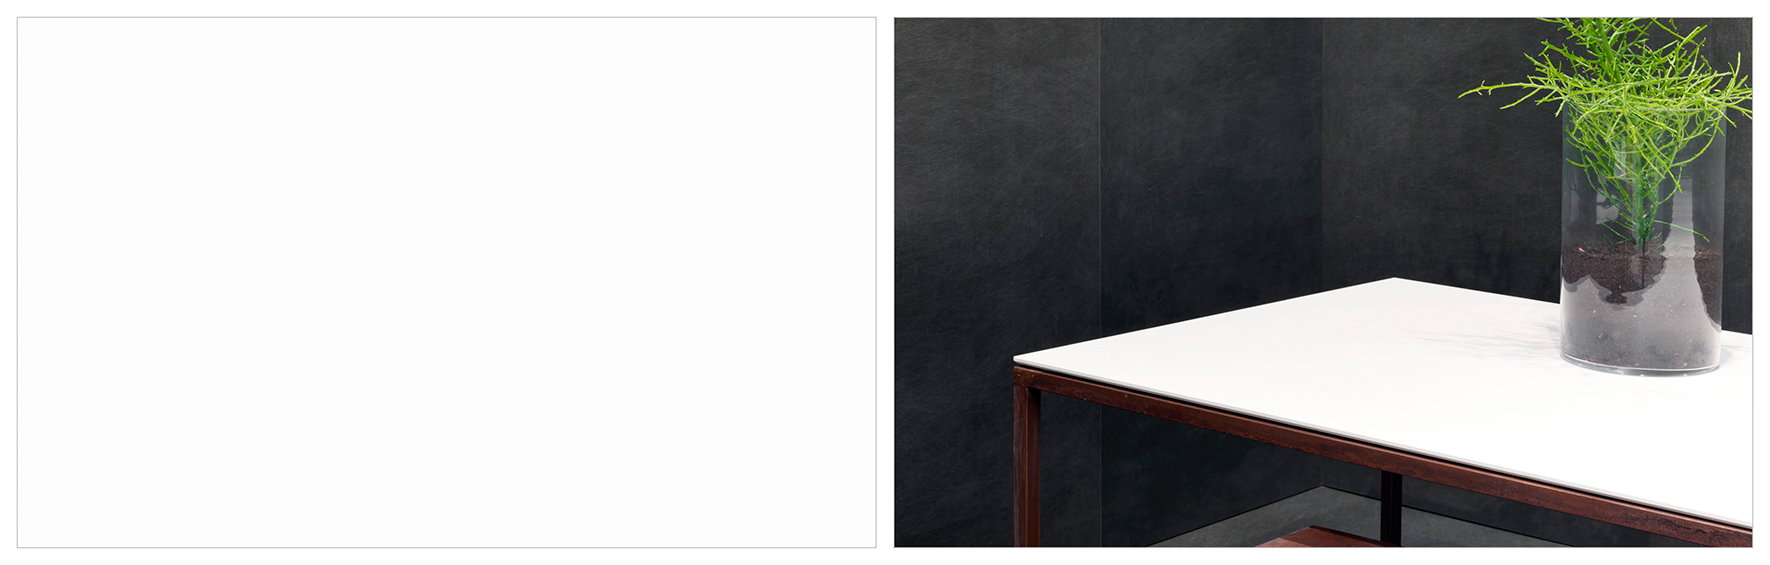 Bianco-Assoluto-1620x3240x12mm